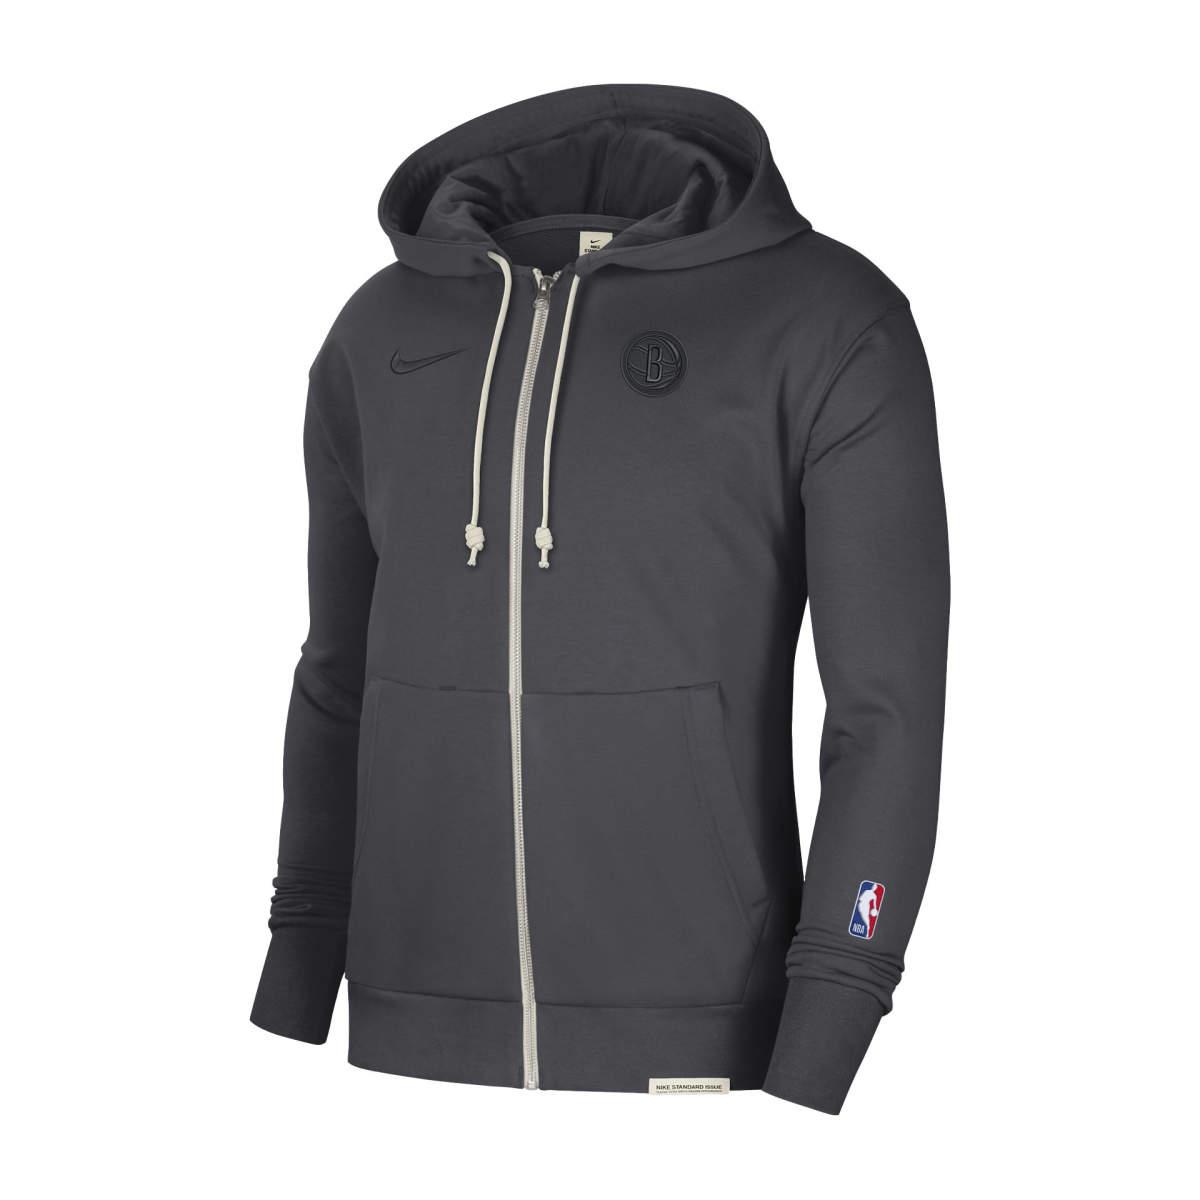 Brooklyn nets standard issue fz hoodie